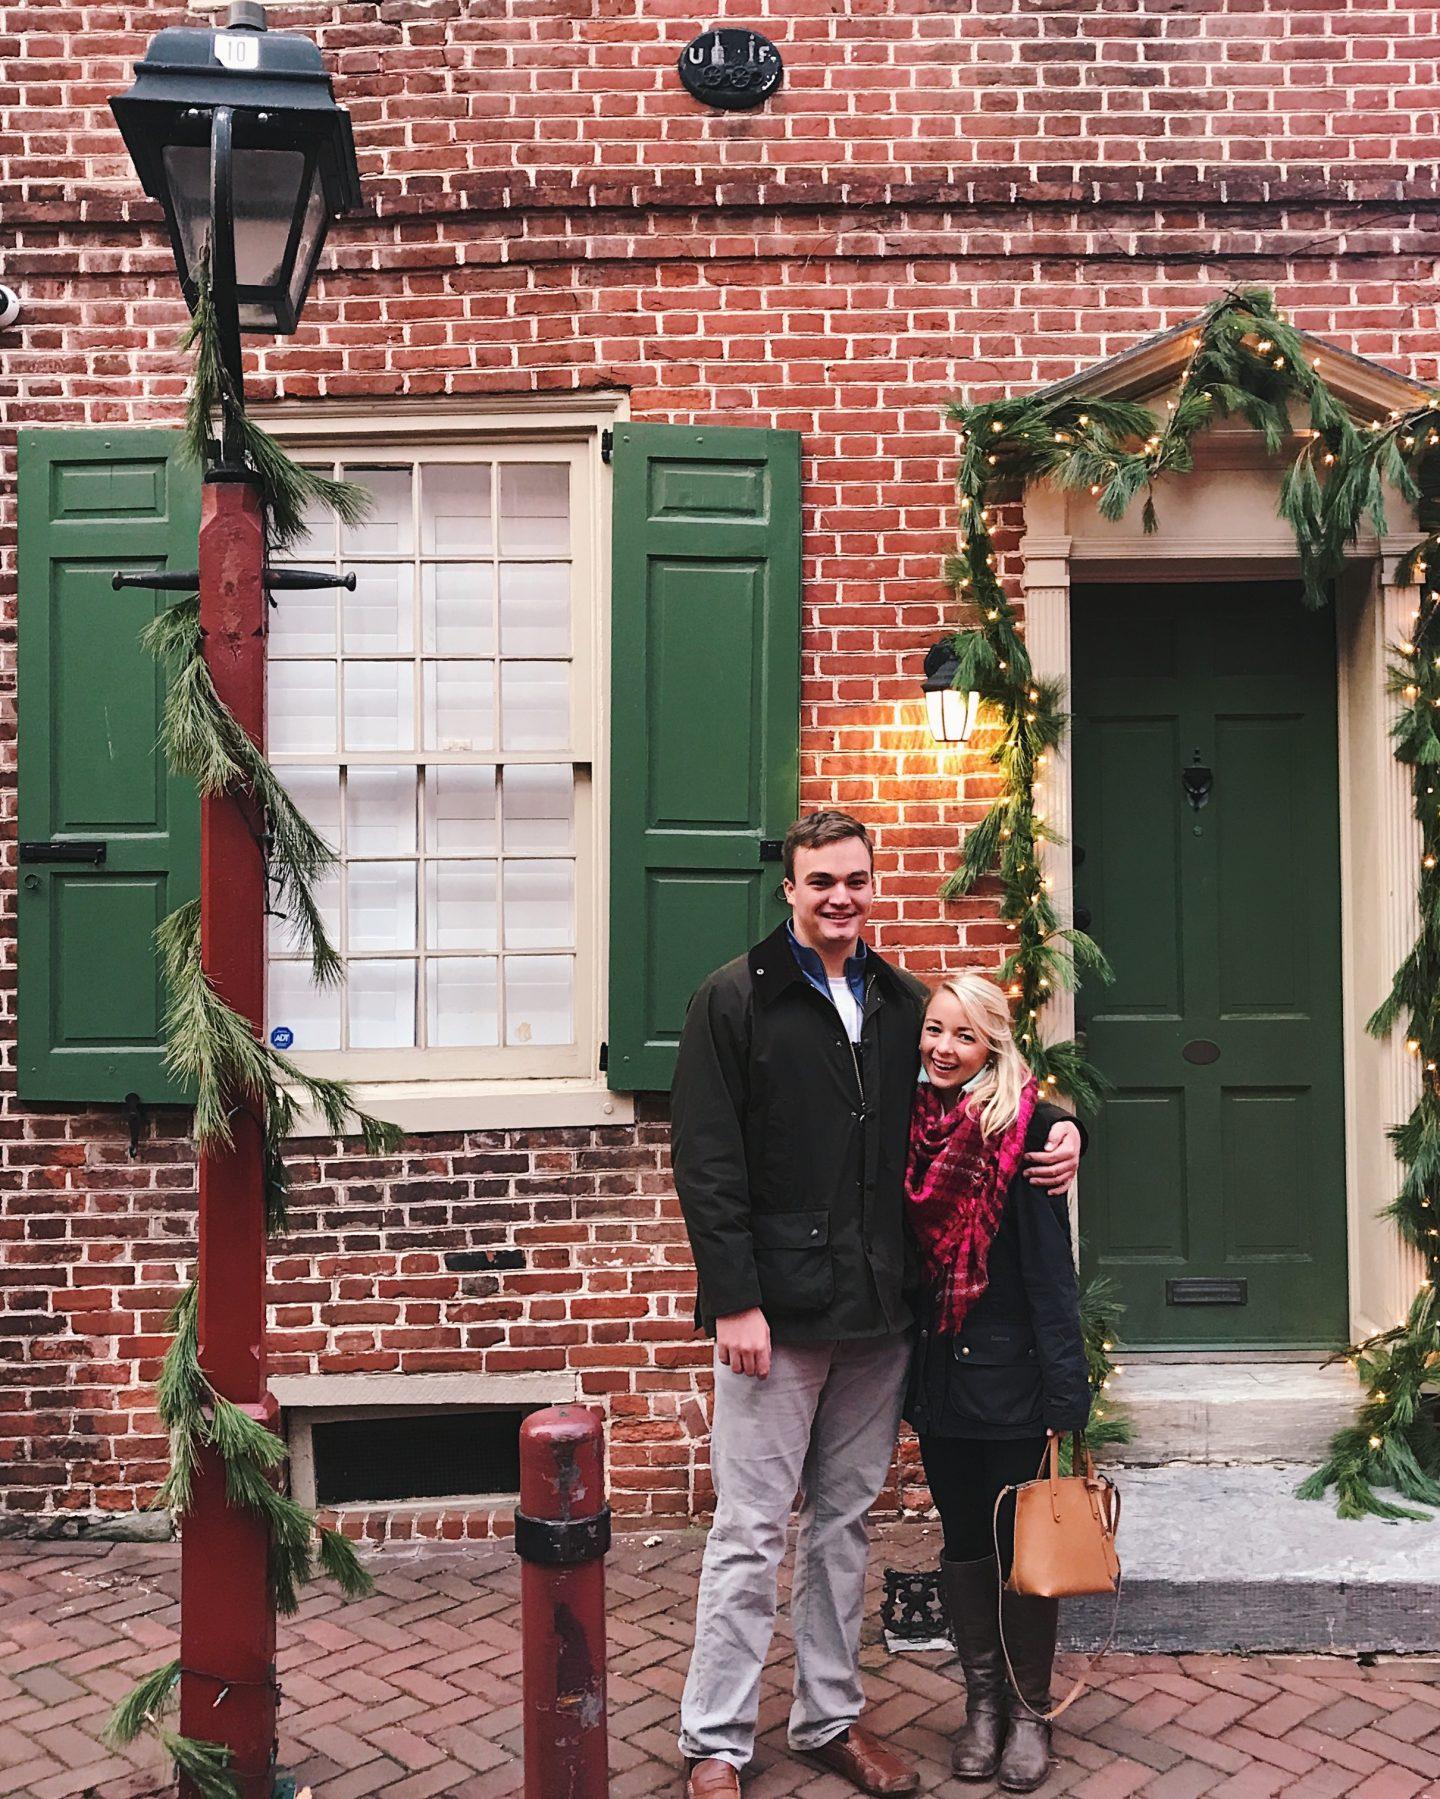 Elfreth's Alley in Philadelphia, PA